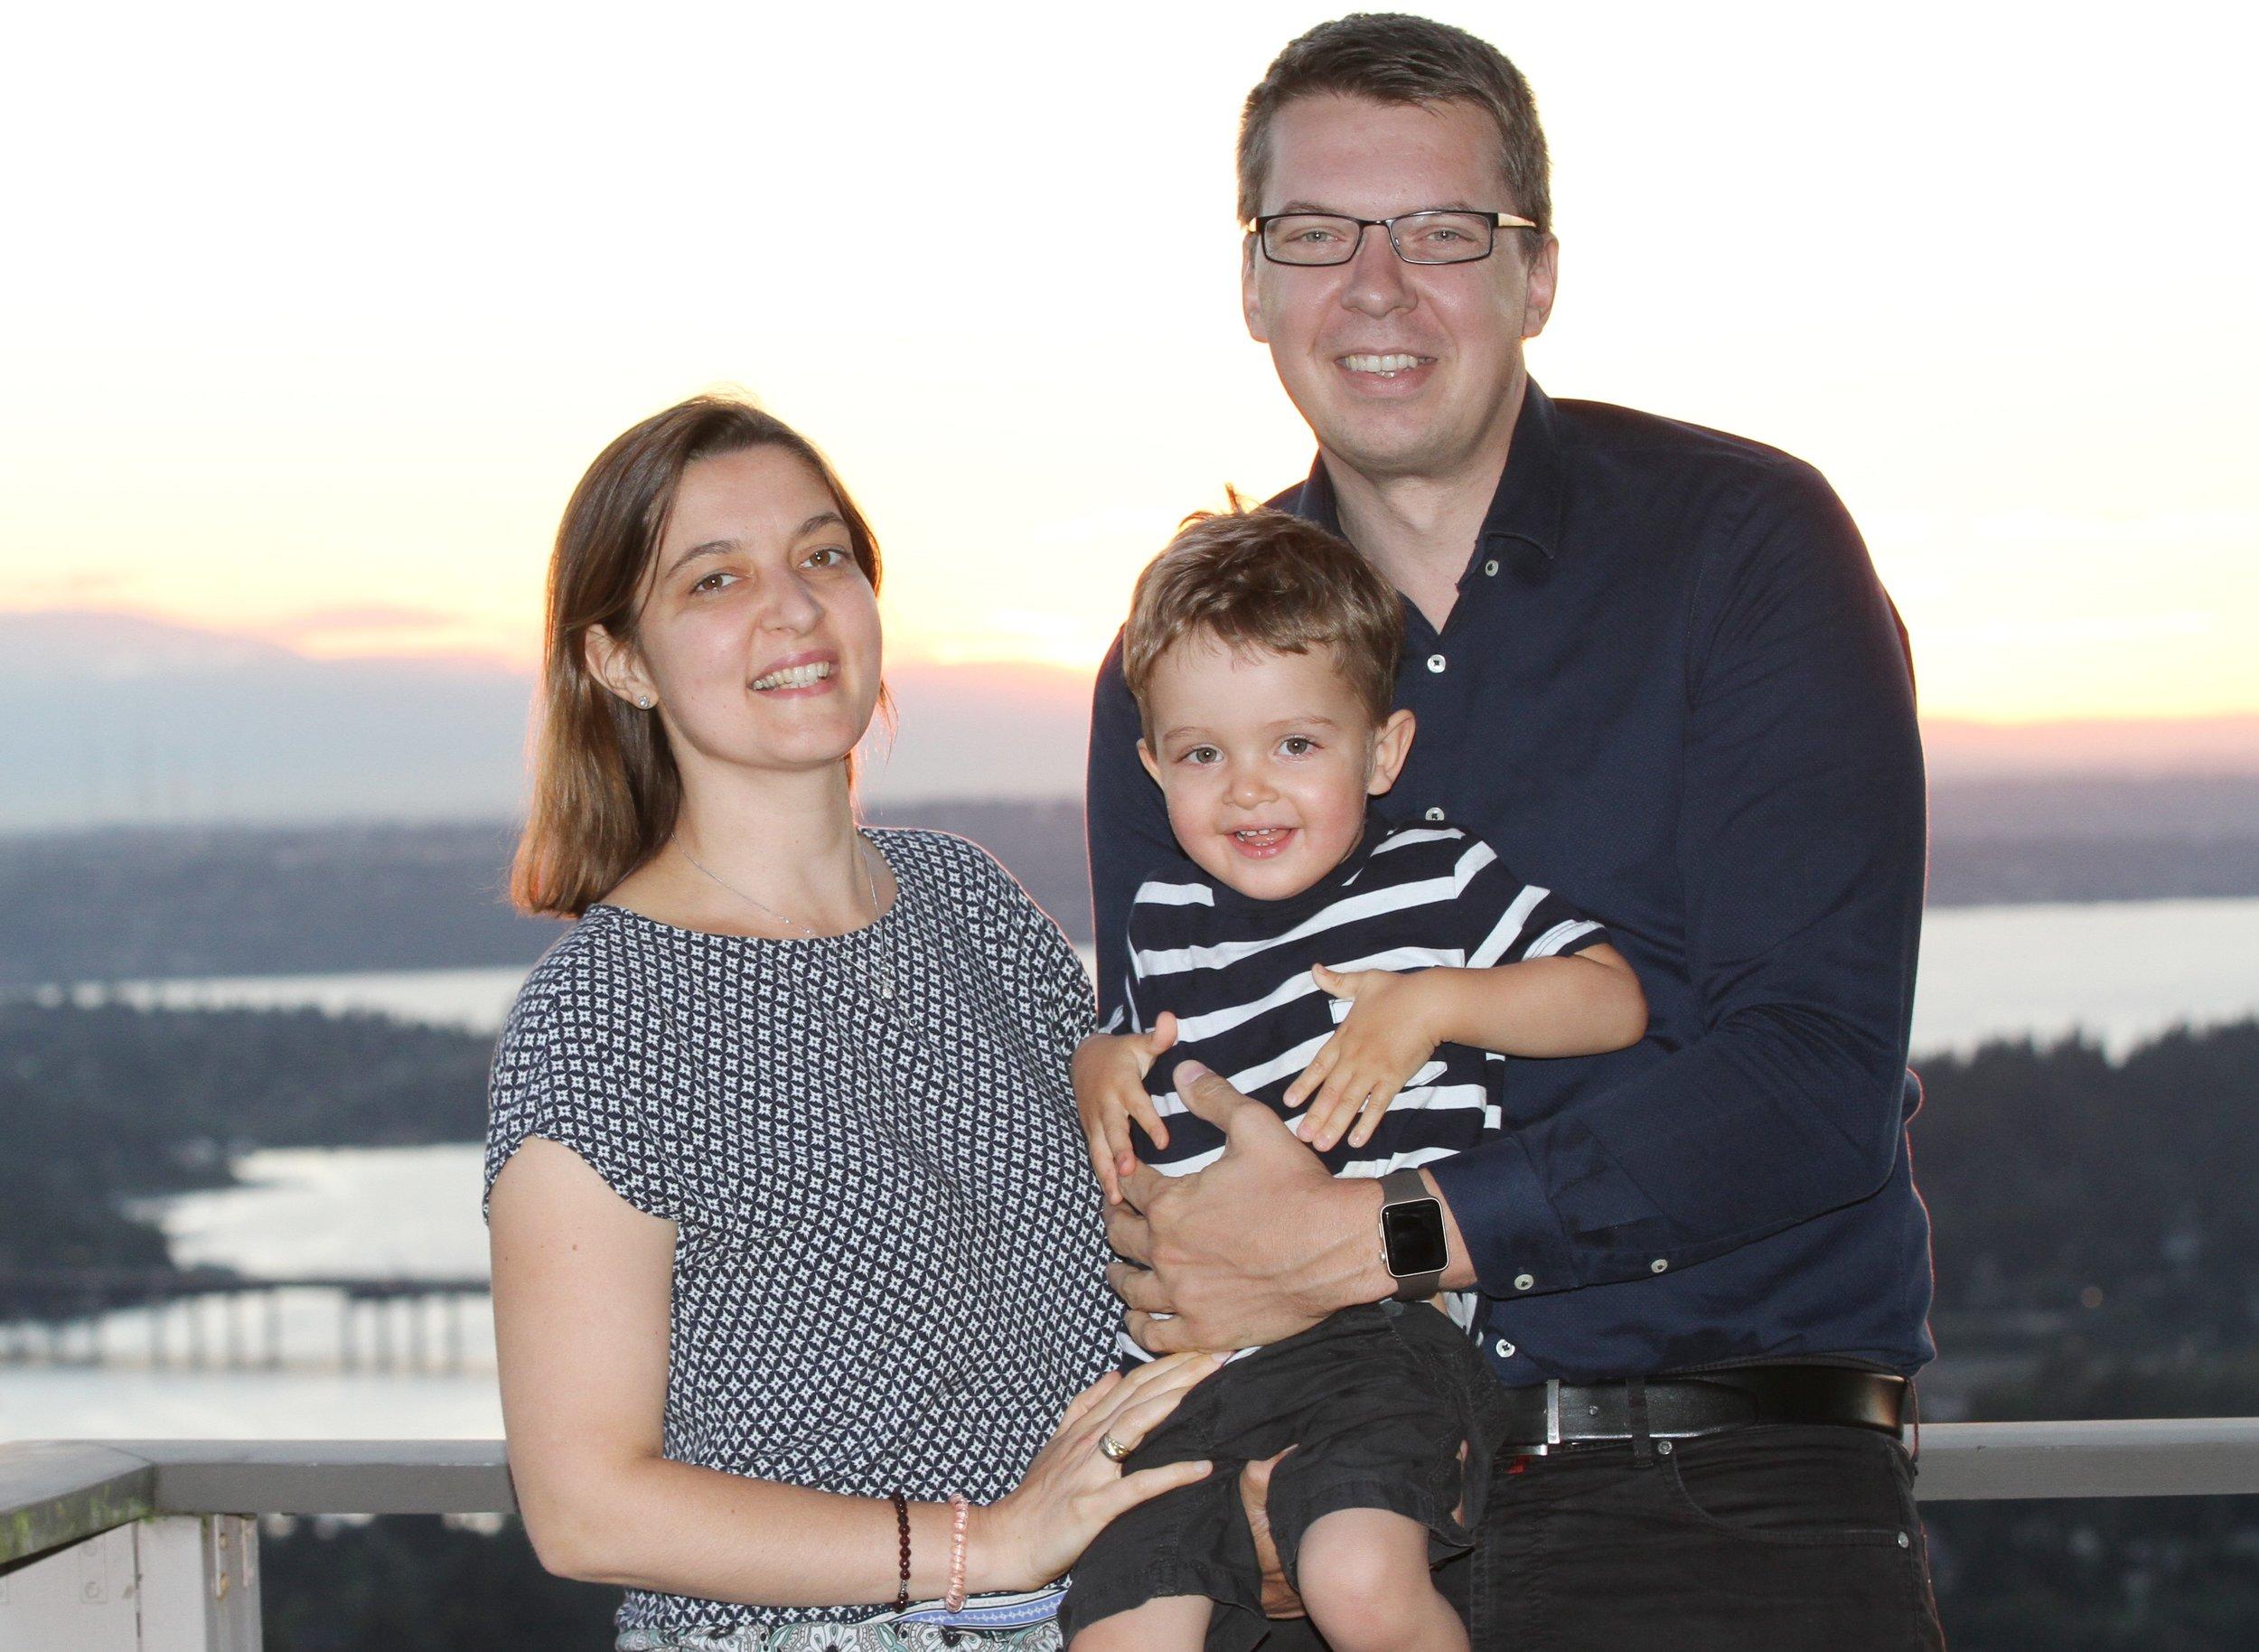 Jonathan, Raphaela and Isaiah Mauerhofer